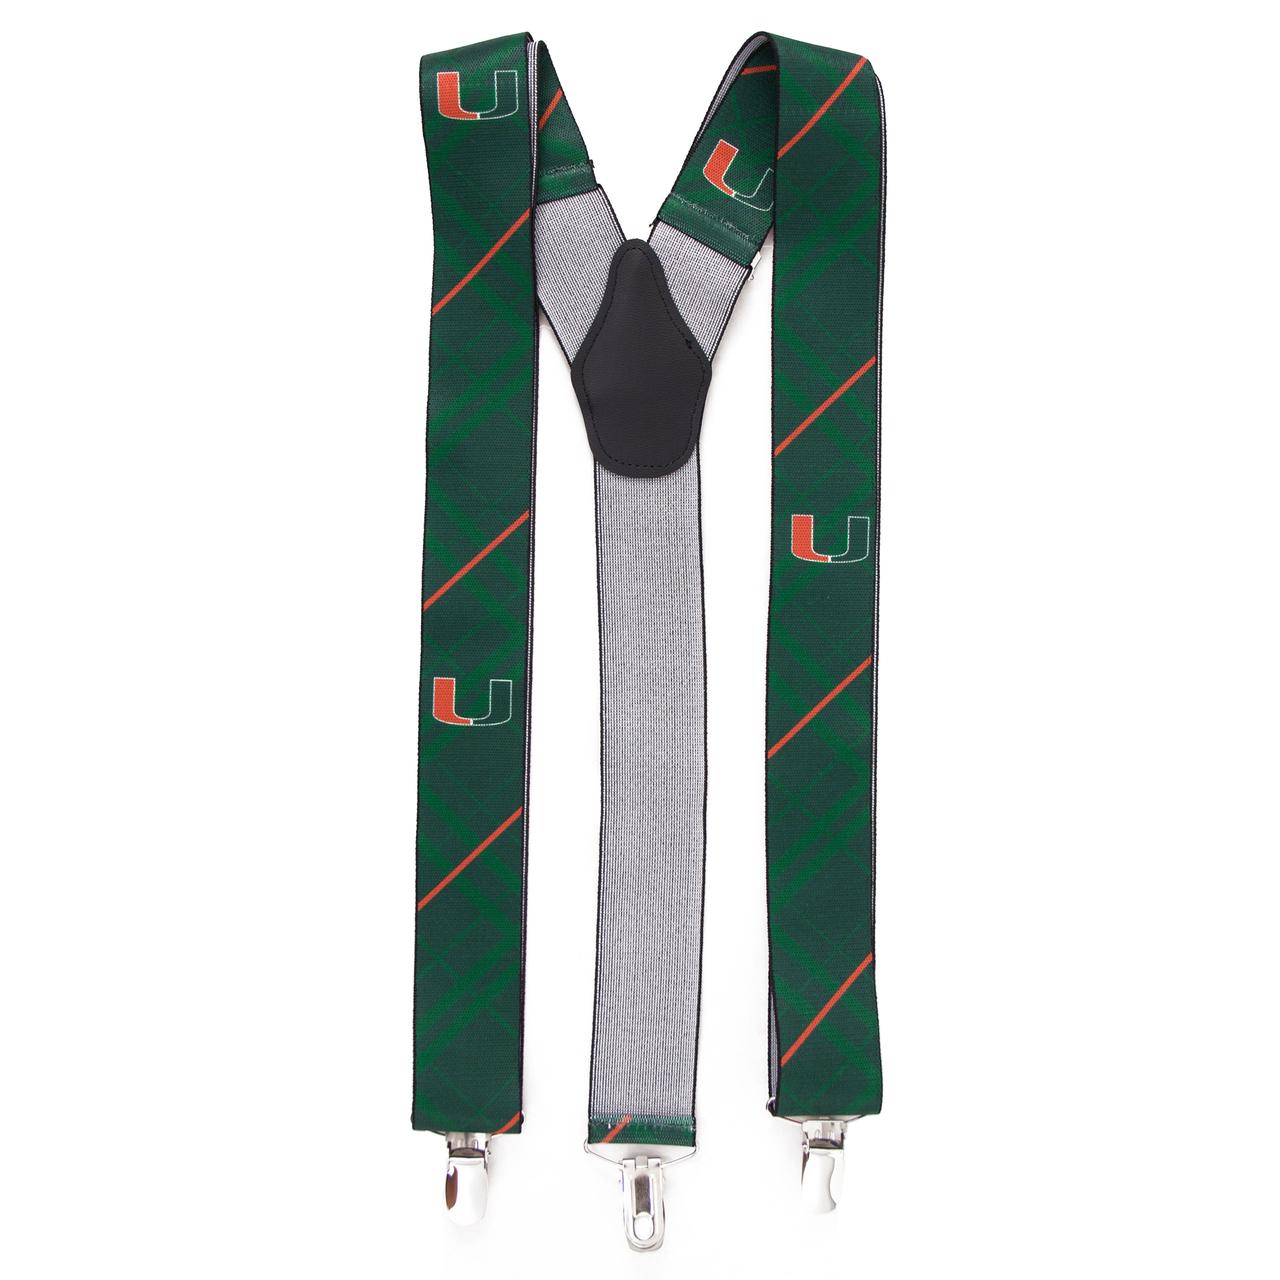 University of Miami Suspenders - Full View